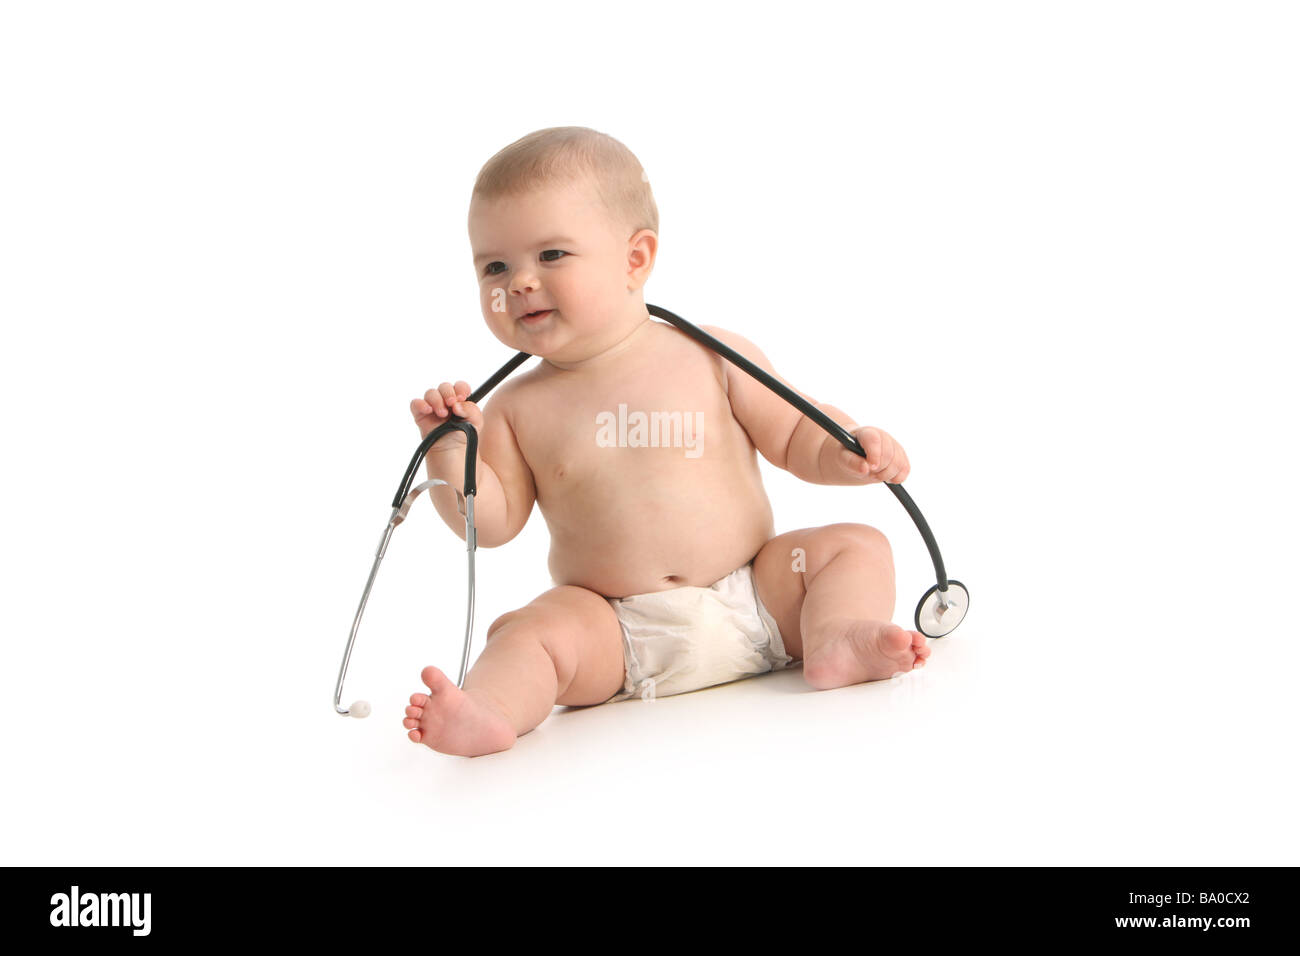 Baby with stethoscope on white background - Stock Image